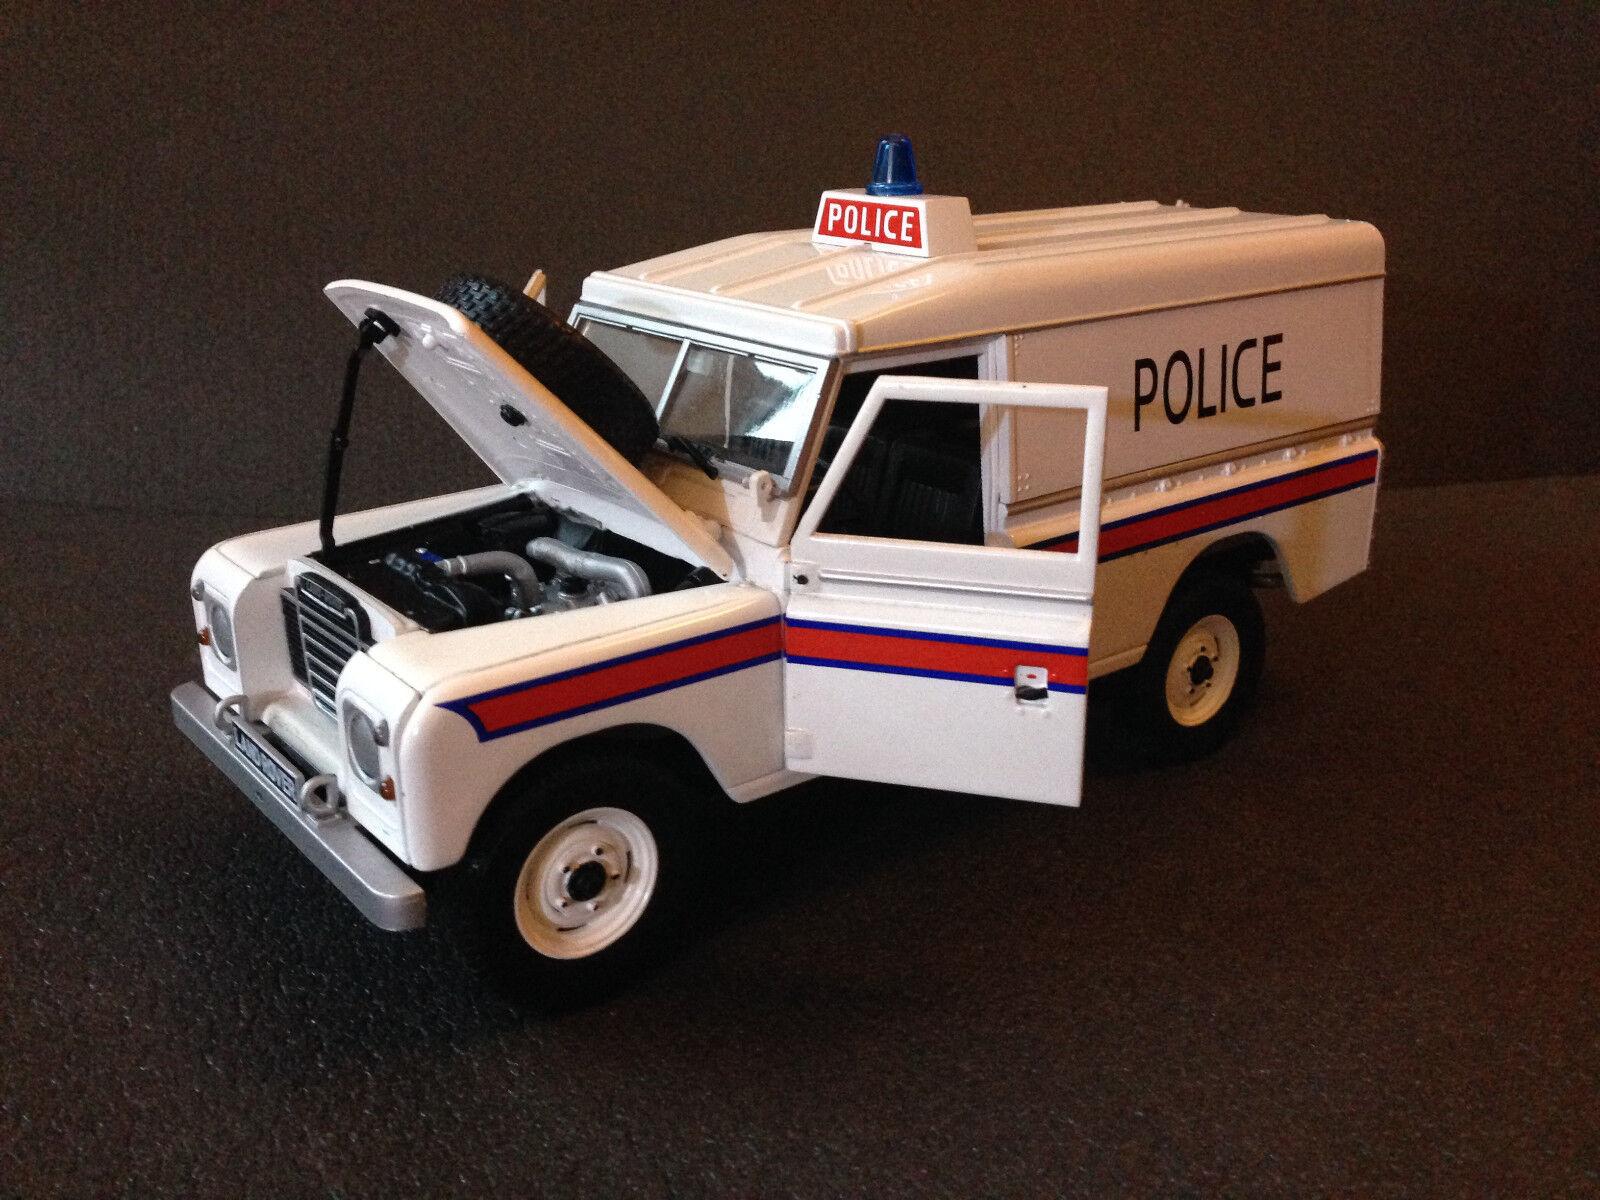 Land Rover Series II III 109 UK Police policía rara vez universal hobbies 1 18